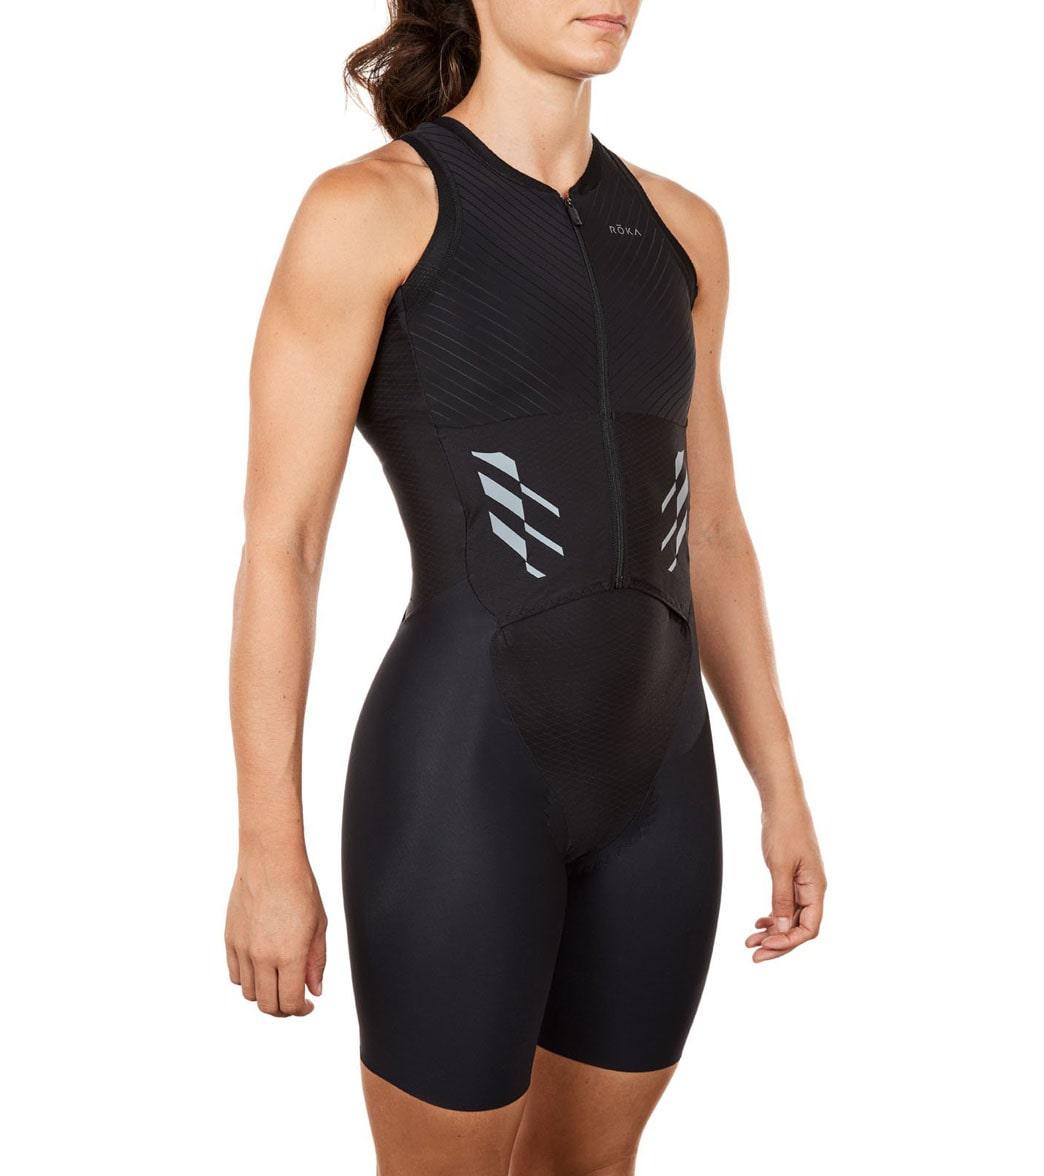 71c968cc284 ROKA Women s Elite Aero II Sleeveless Tri Suit at SwimOutlet.com ...